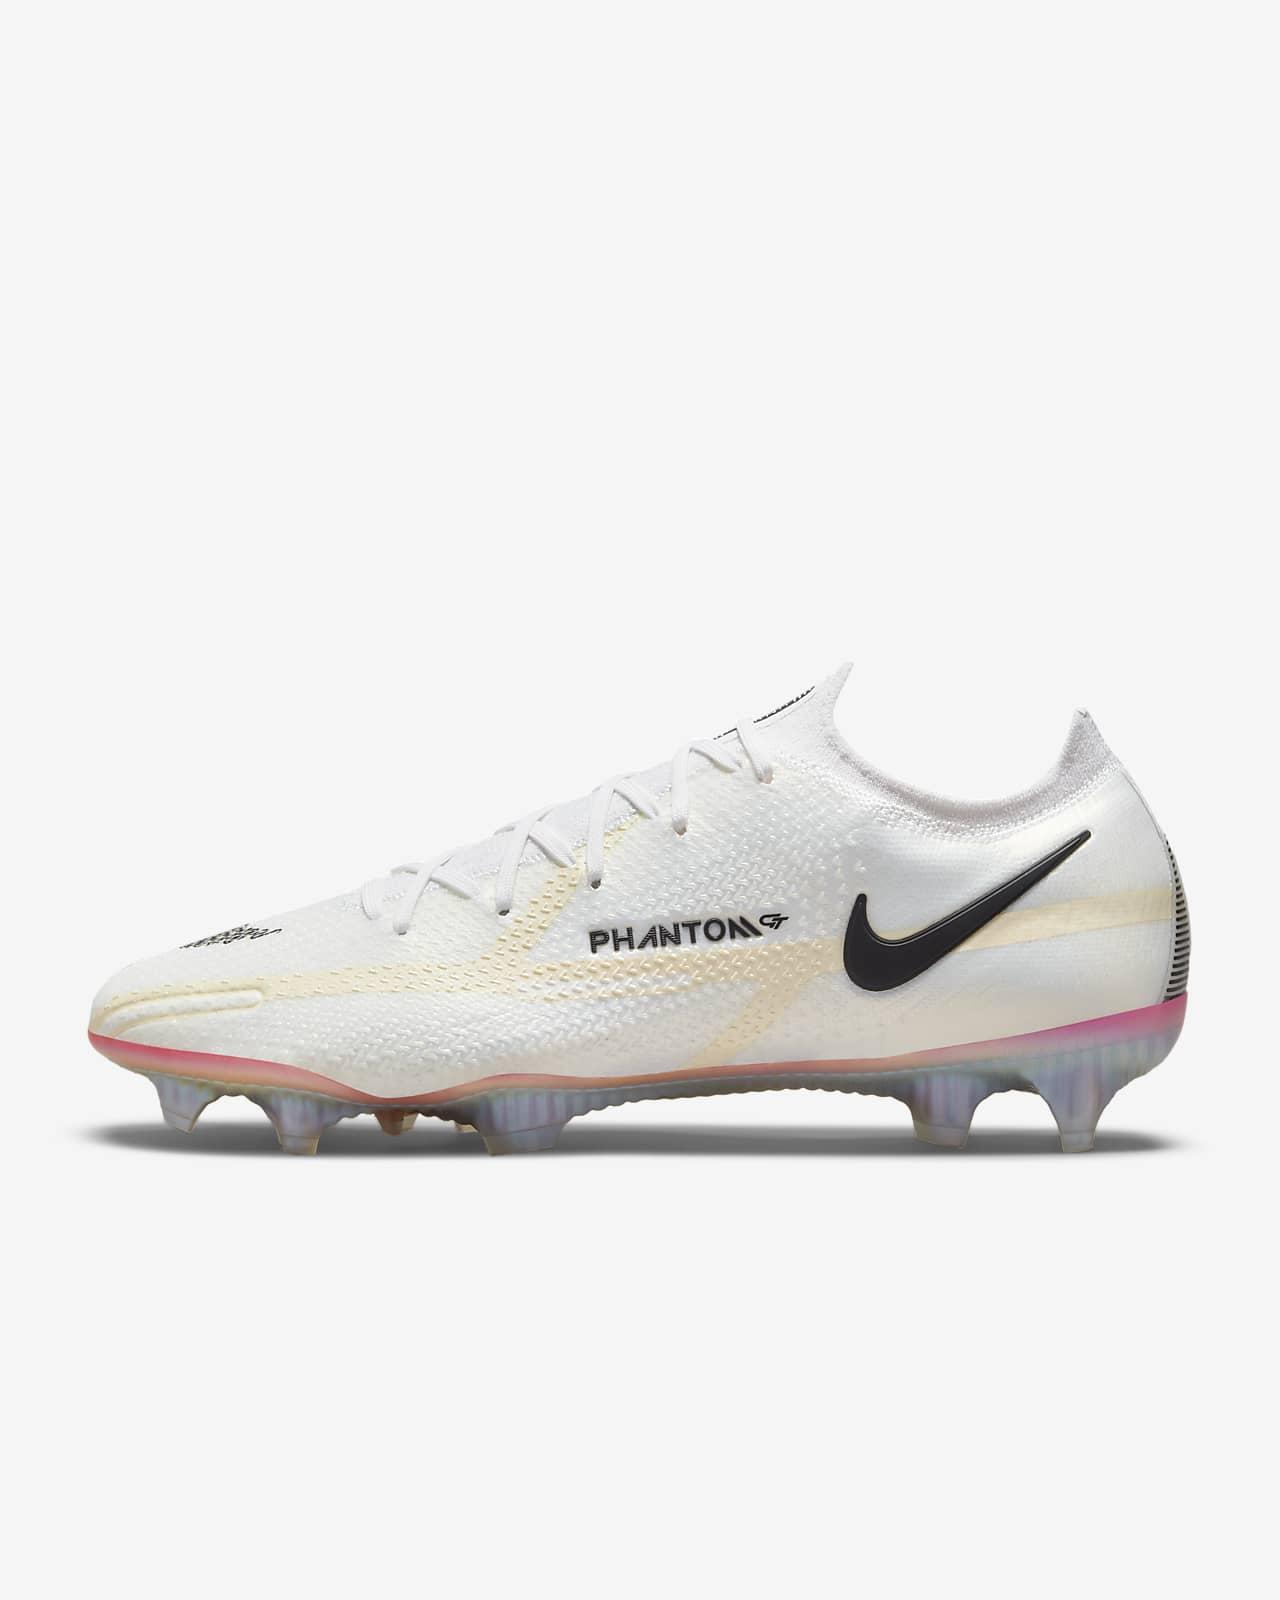 Nike Phantom GT2 Elite FG Firm-Ground Soccer Cleat